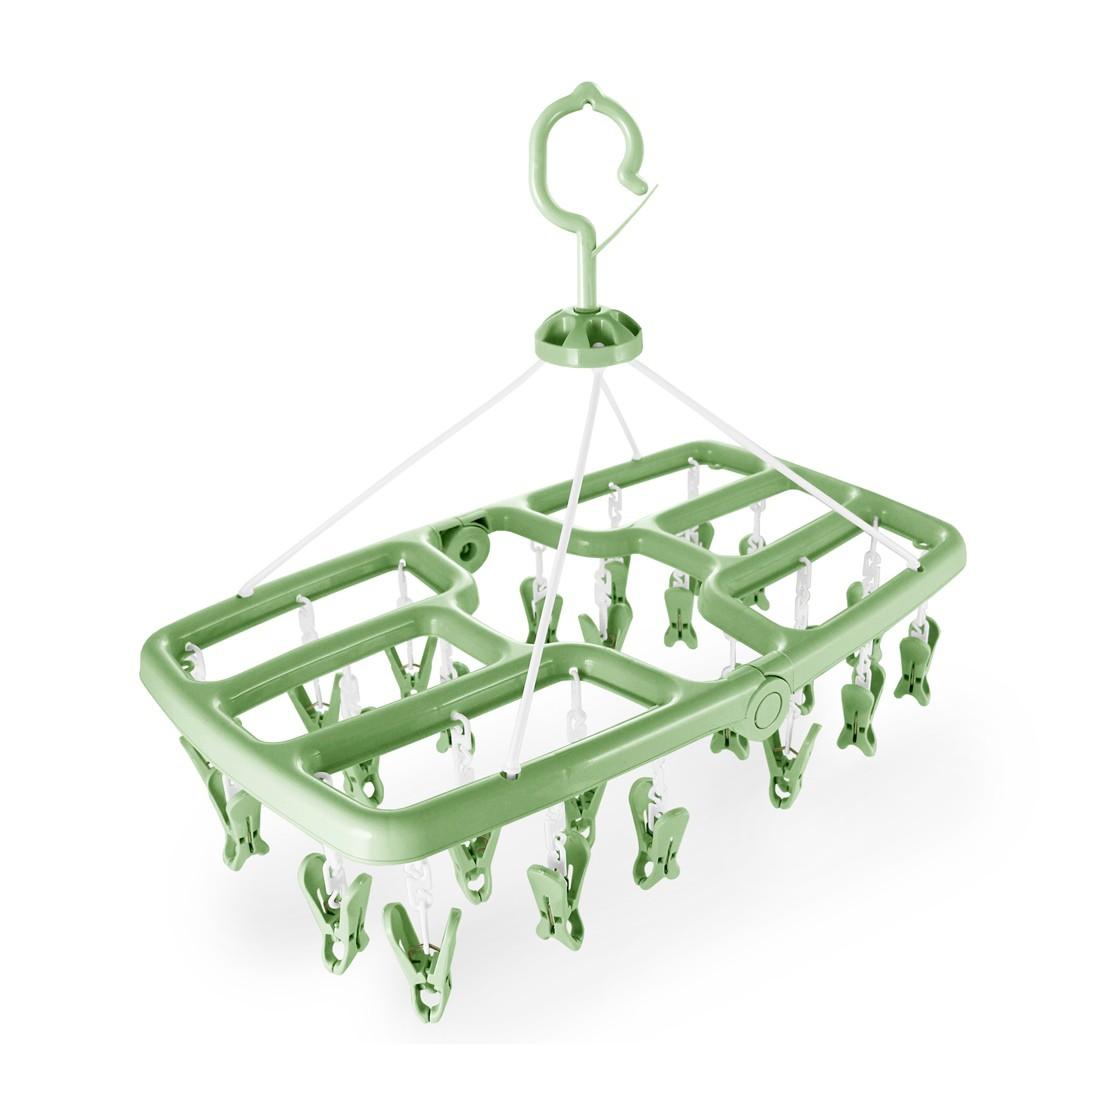 Mini Varal Retangular com 24 Prendedores Lifestyle Jacki Design